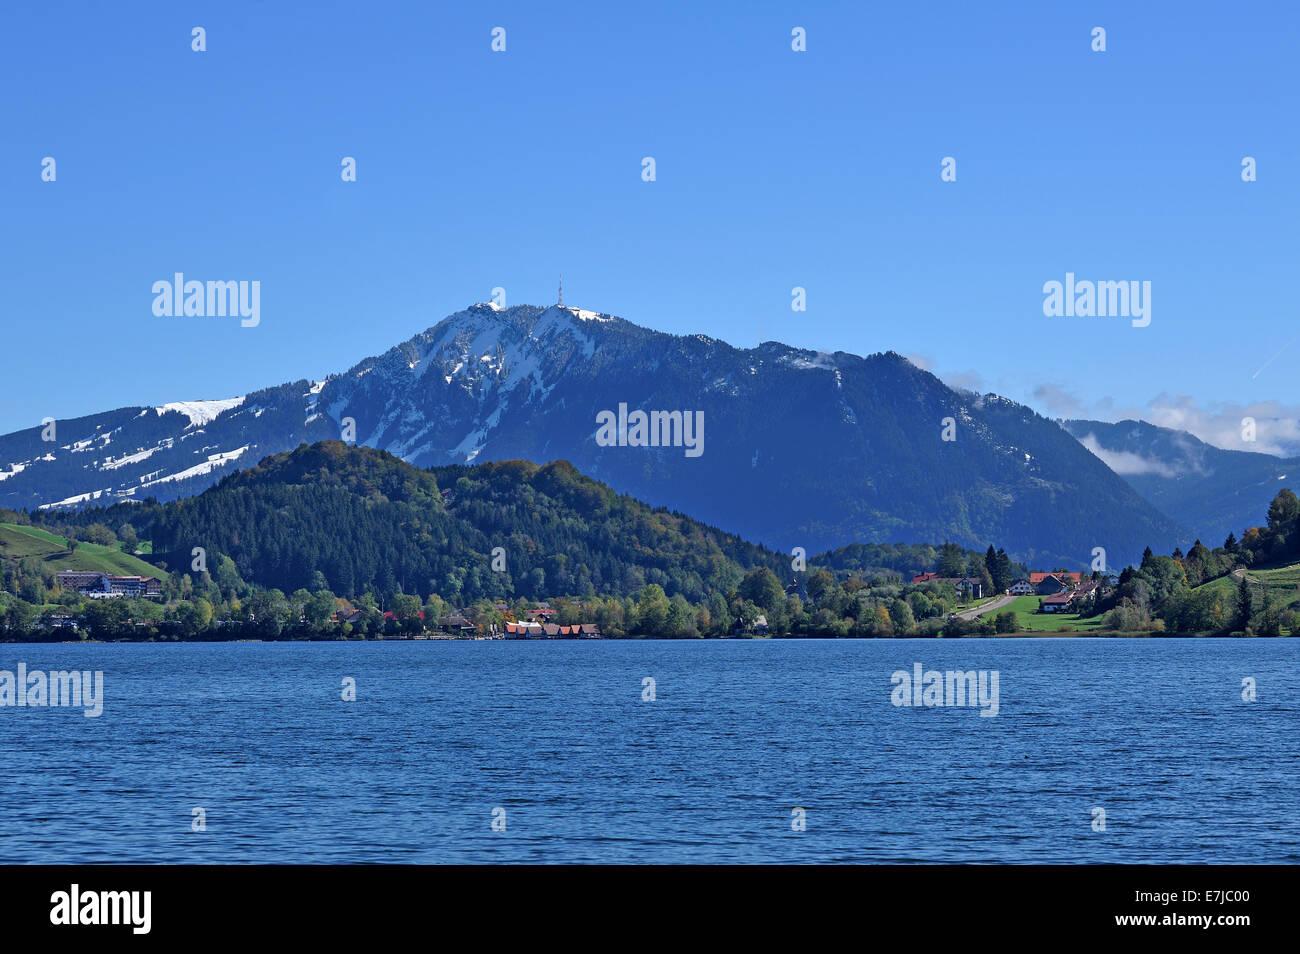 Snow-covered Grünten Mountain behind Alpsee lake, Upper Allgäu, Bavaria, Germany Stock Photo